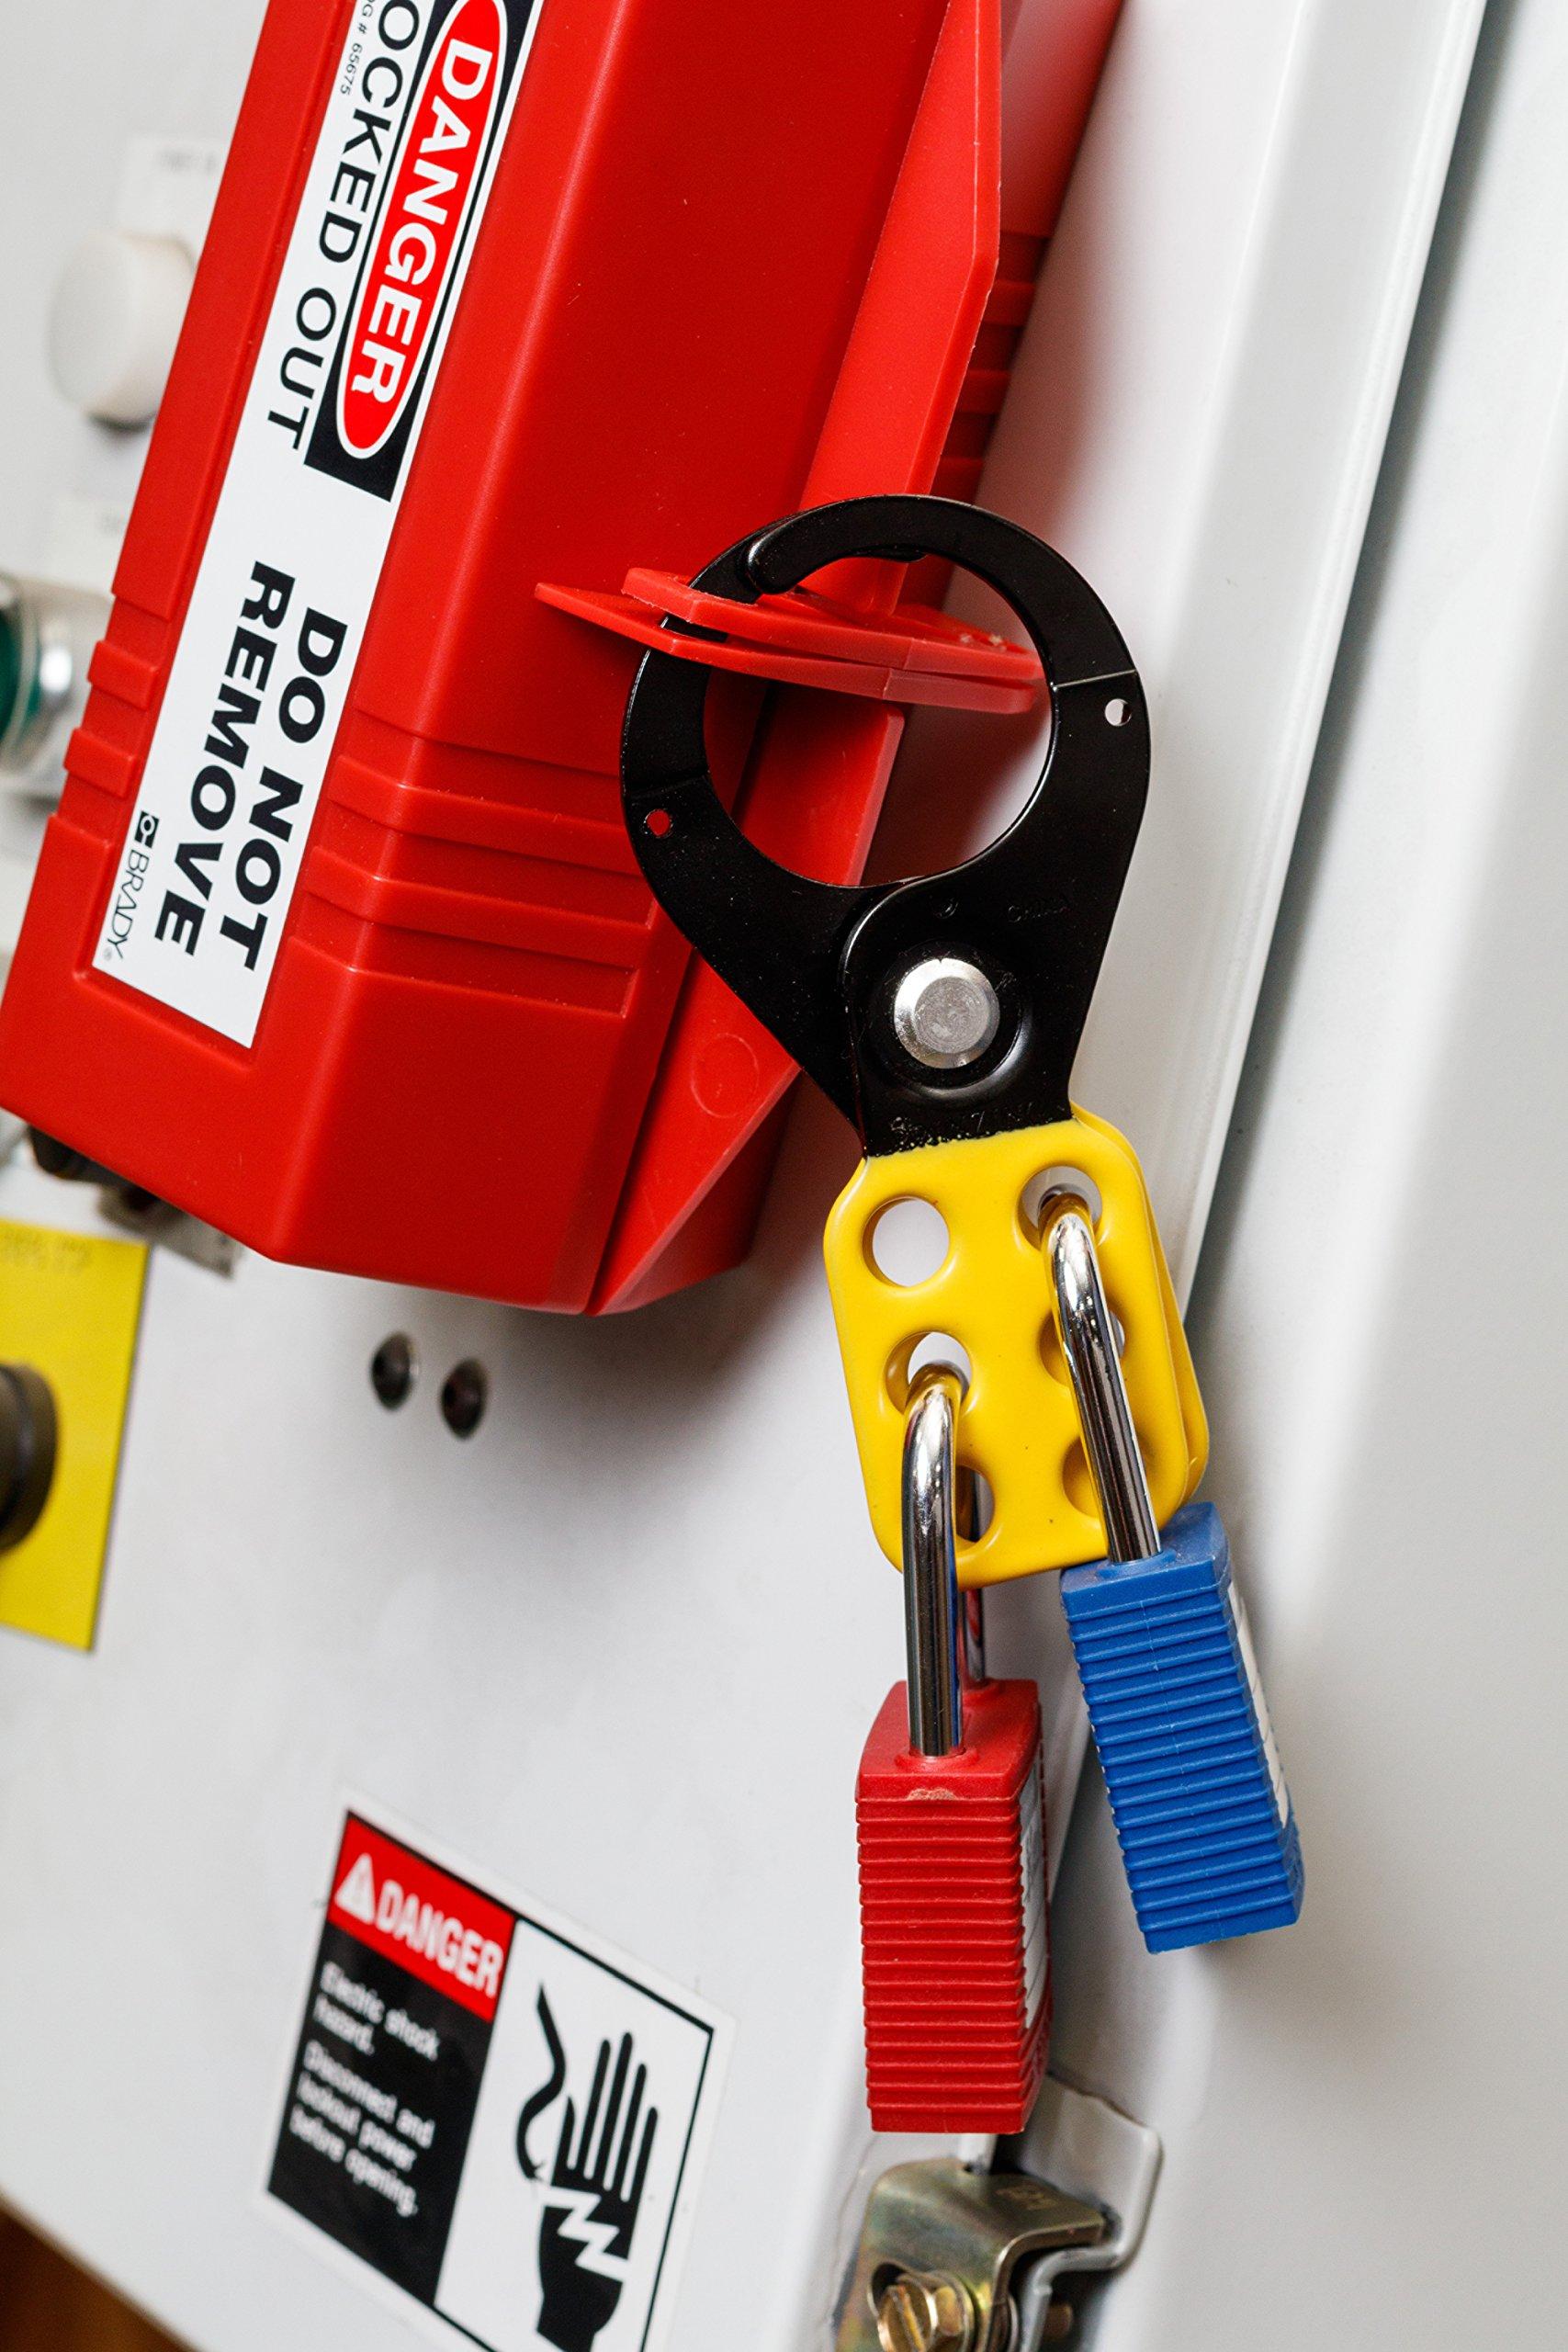 Brady Personal Electrical Lockout Toolbox Kit, Includes 2 Safety Padlocks by Brady (Image #2)